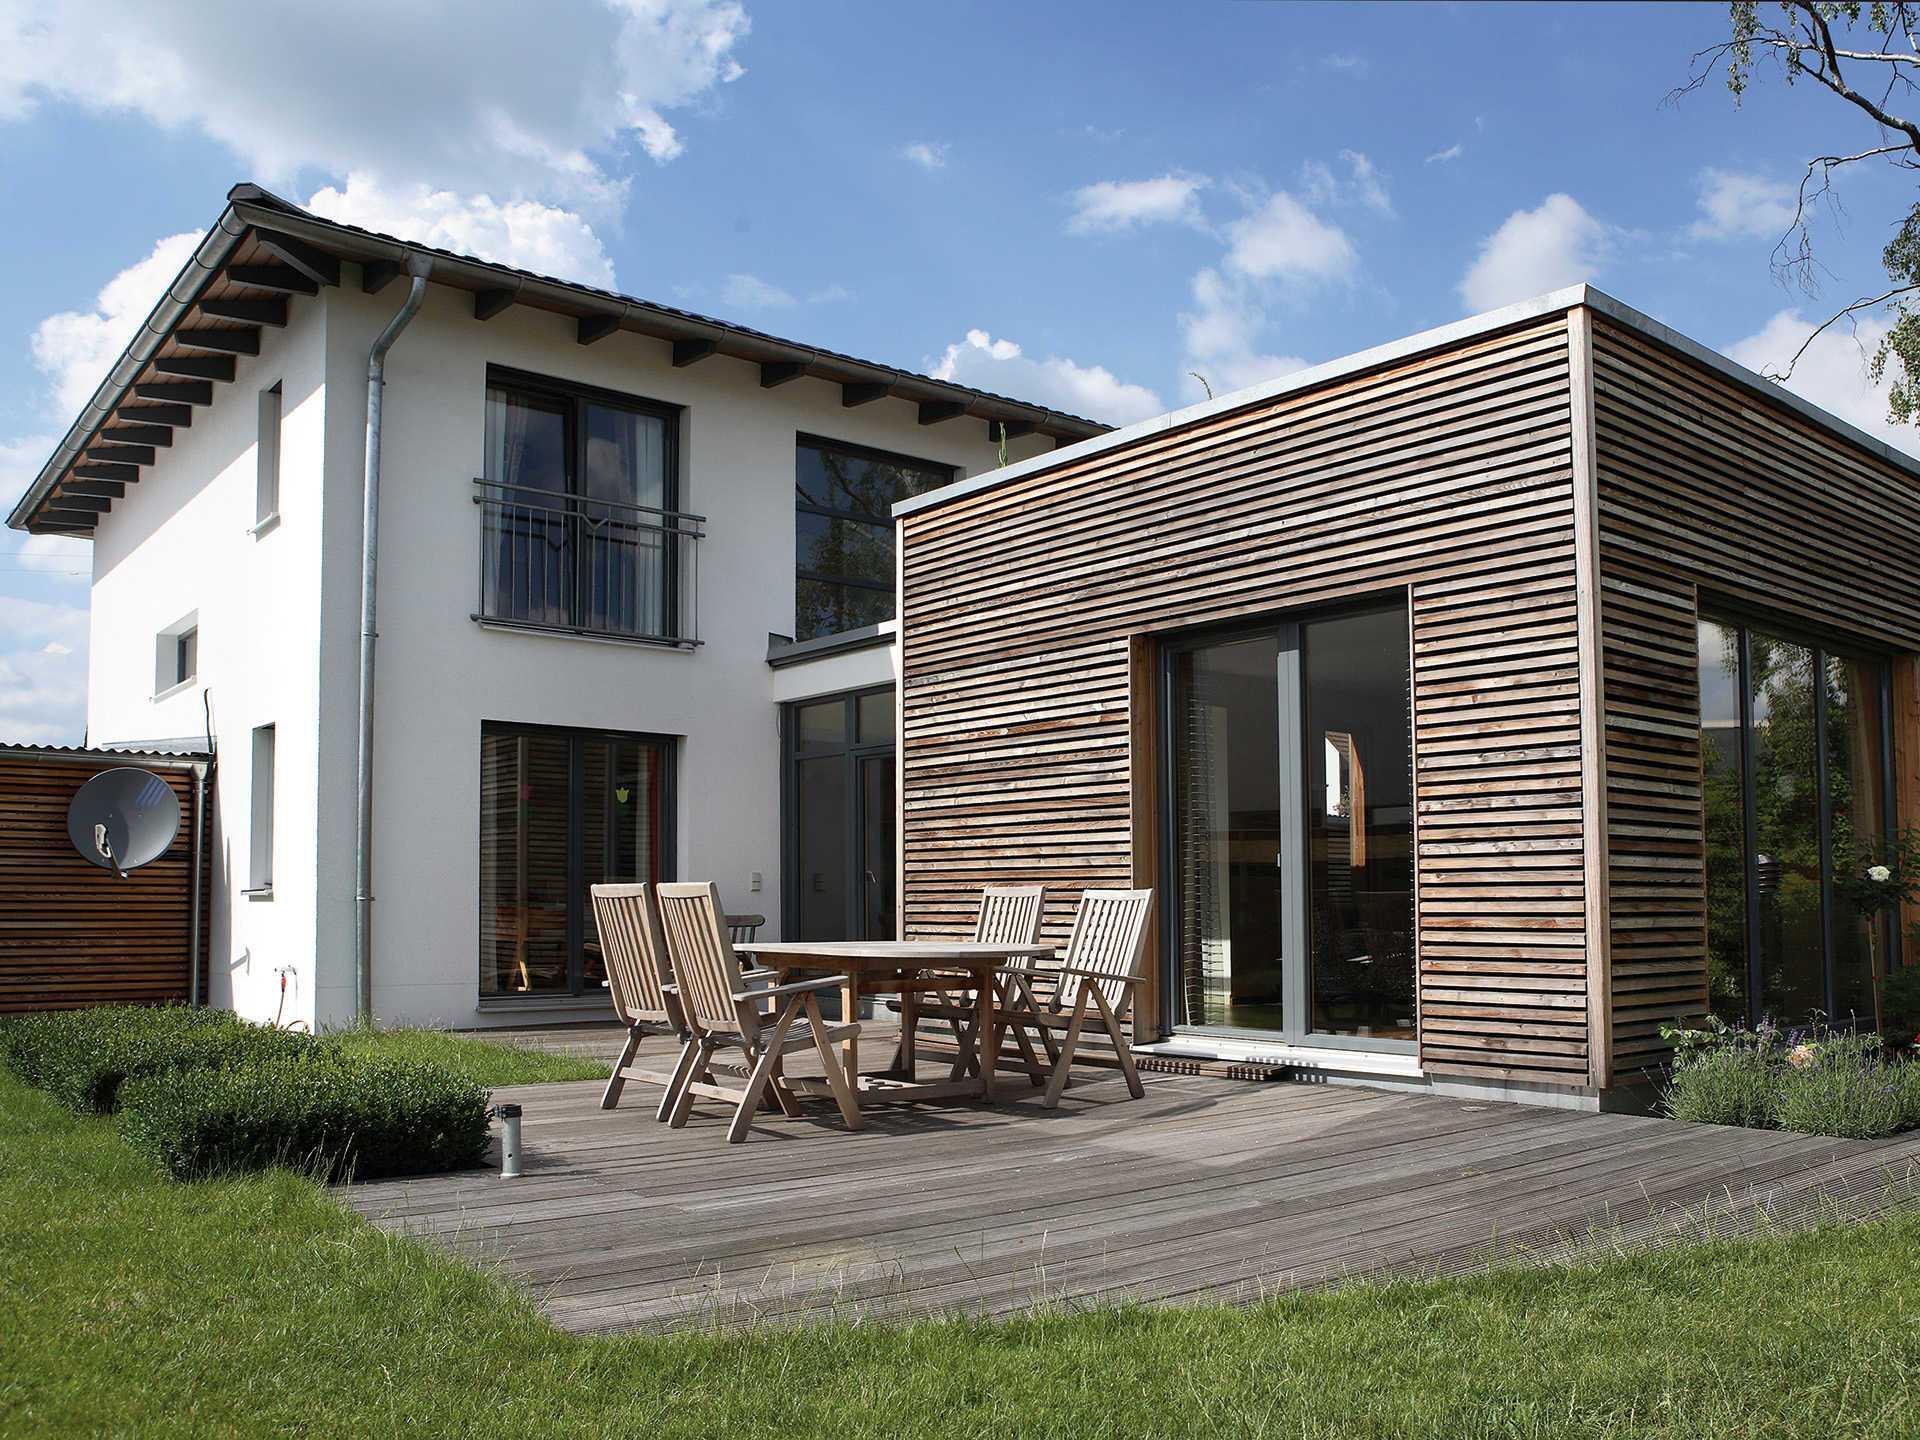 Gruber Naturholzhaus GmbH Referenzhaus 4